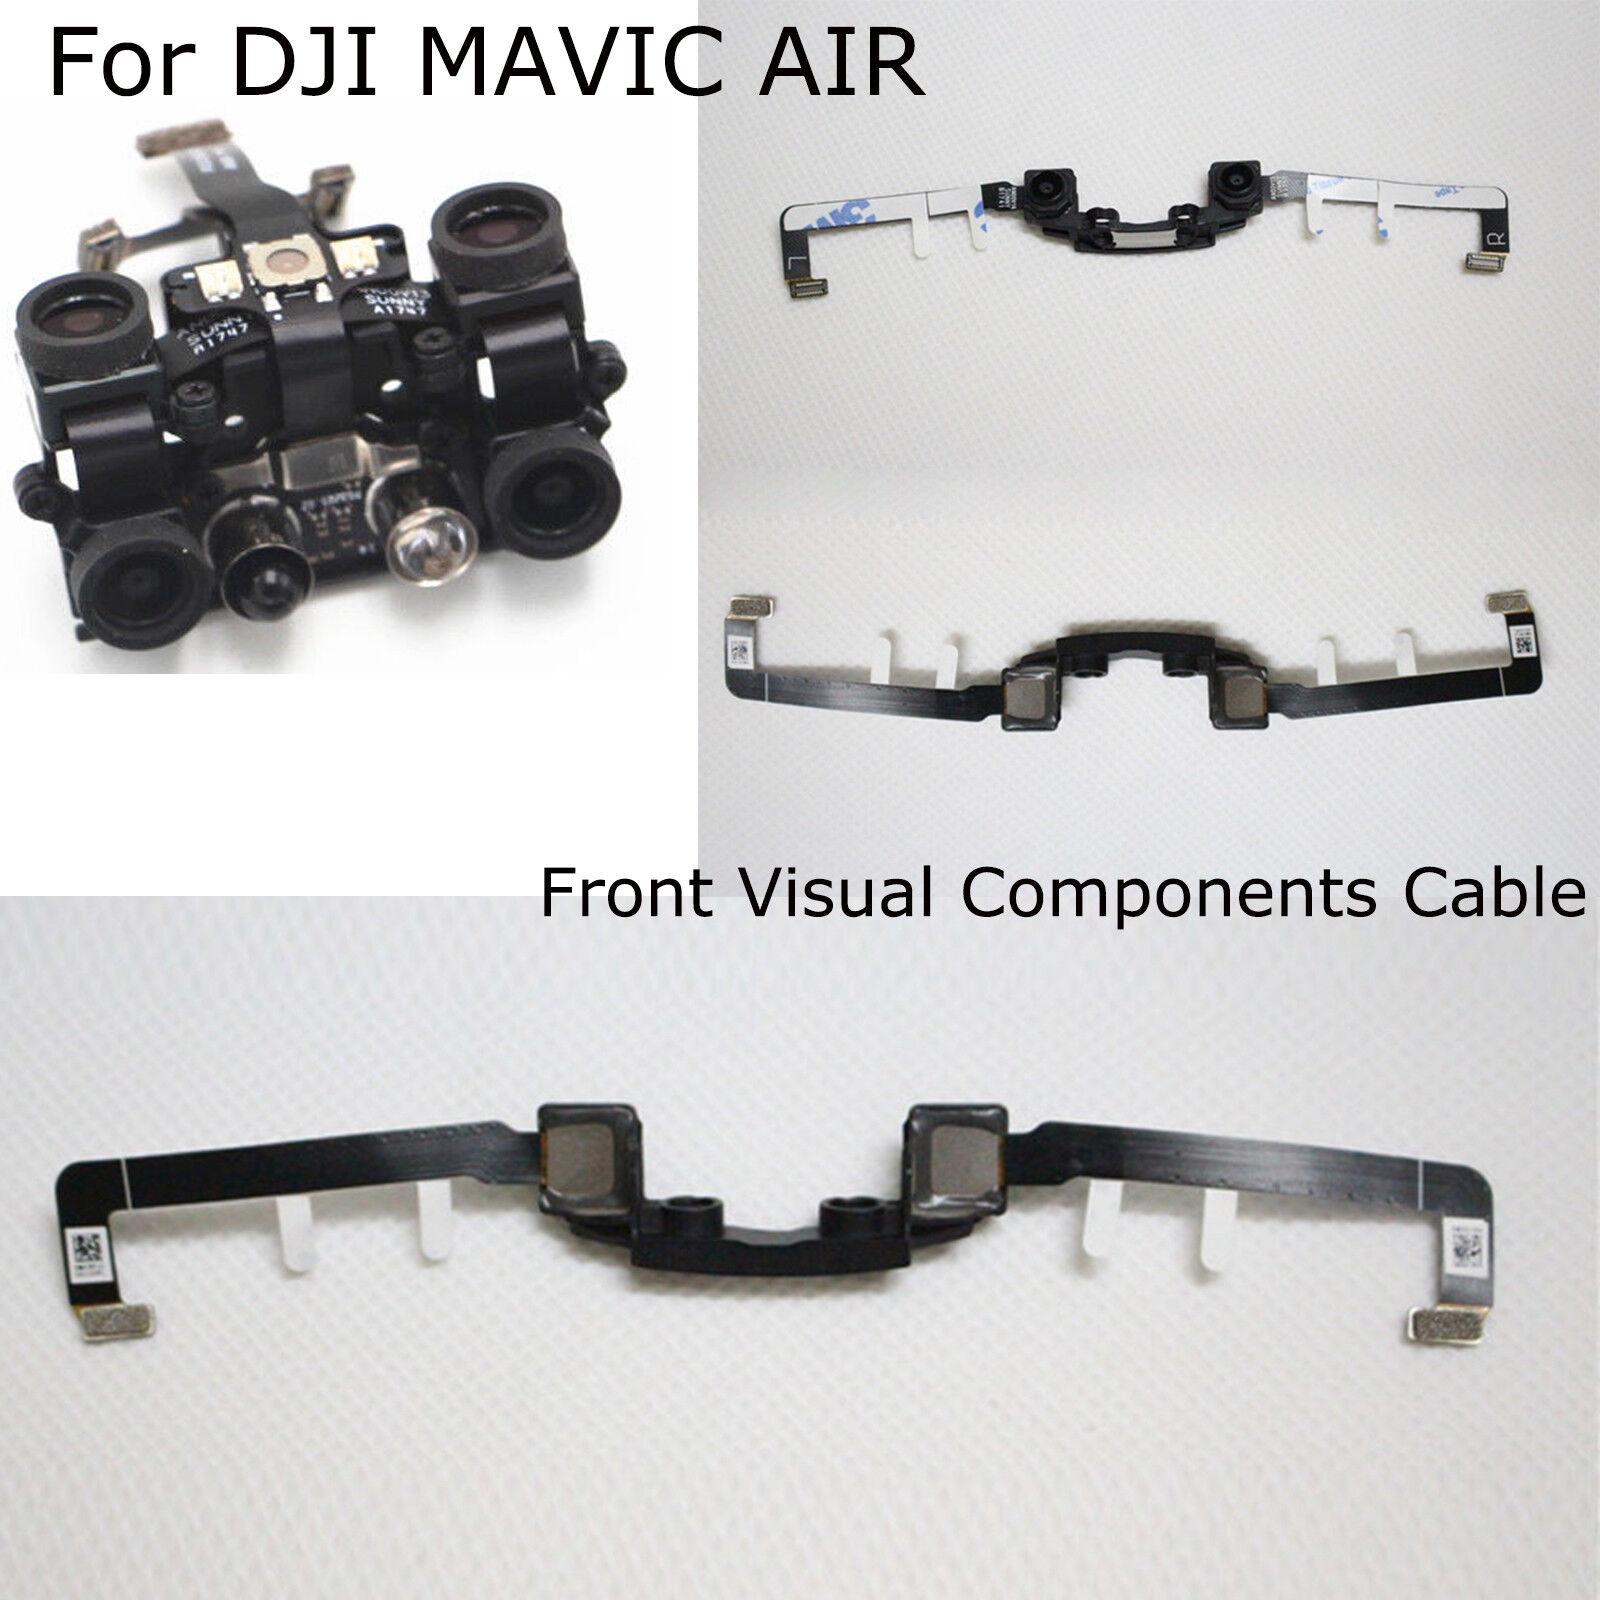 Front Visual Visual Visual Component Obstacle Cable Repair Parts for DJI MAVIC AIR Drone New 2d9b73